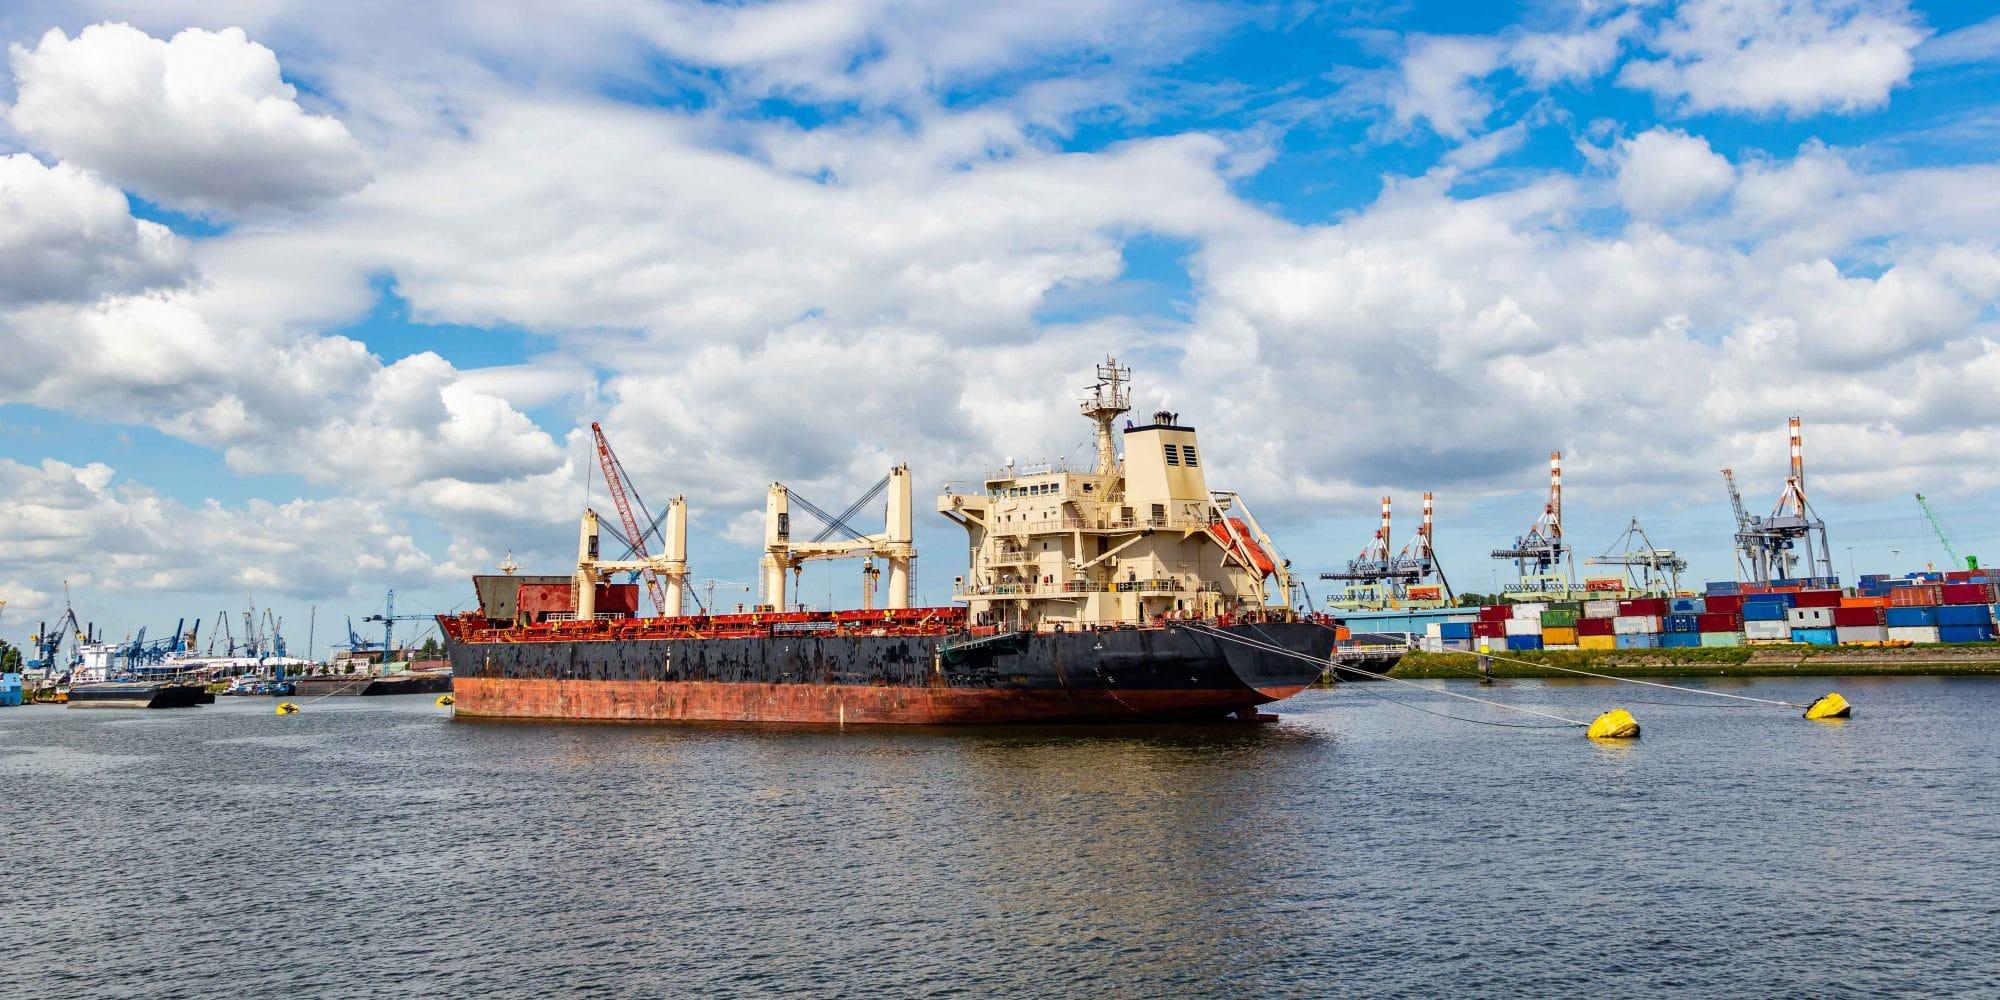 Ramon Heeres houdt Rotterdamse haven bevaarbaar